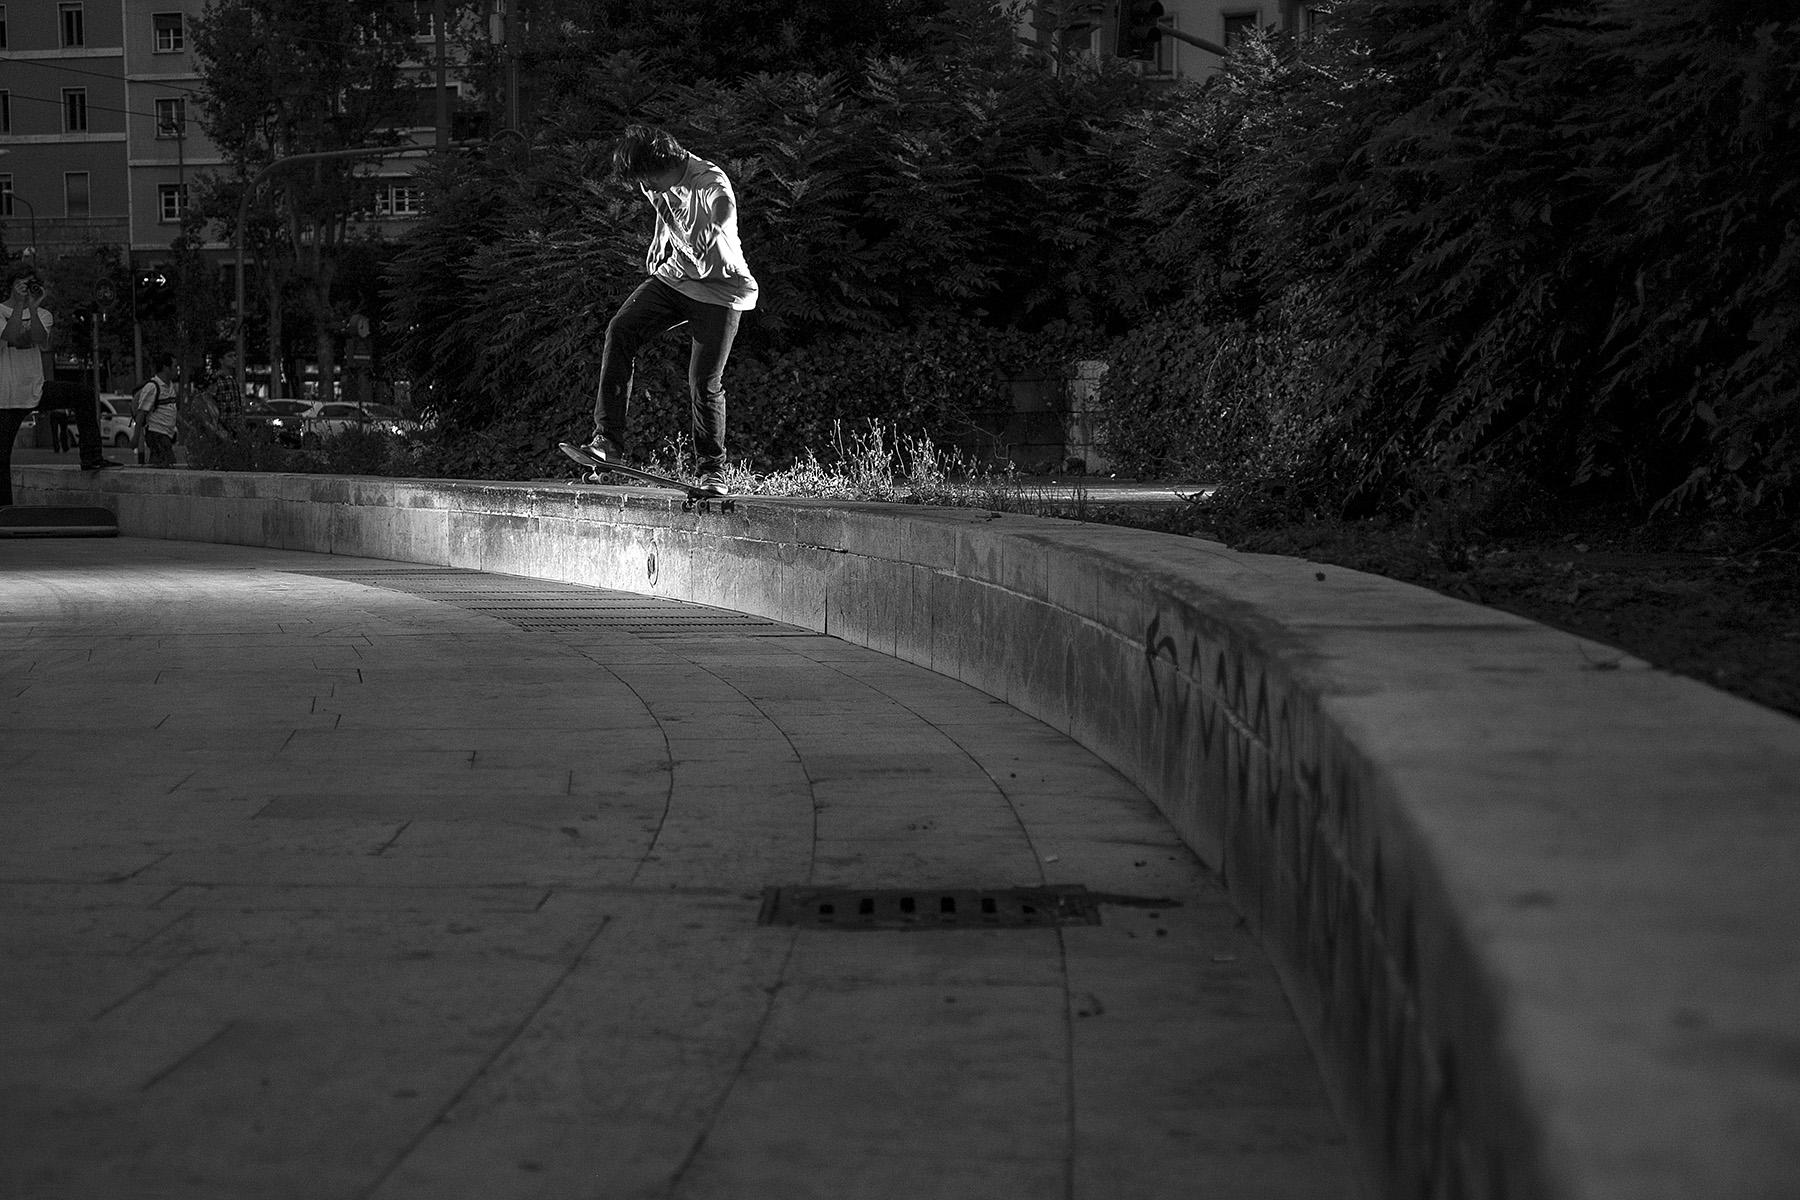 Leo Schulz – Nollie Backside Tailslide |  Mailand Centrale | Foto: Martin Herrmann